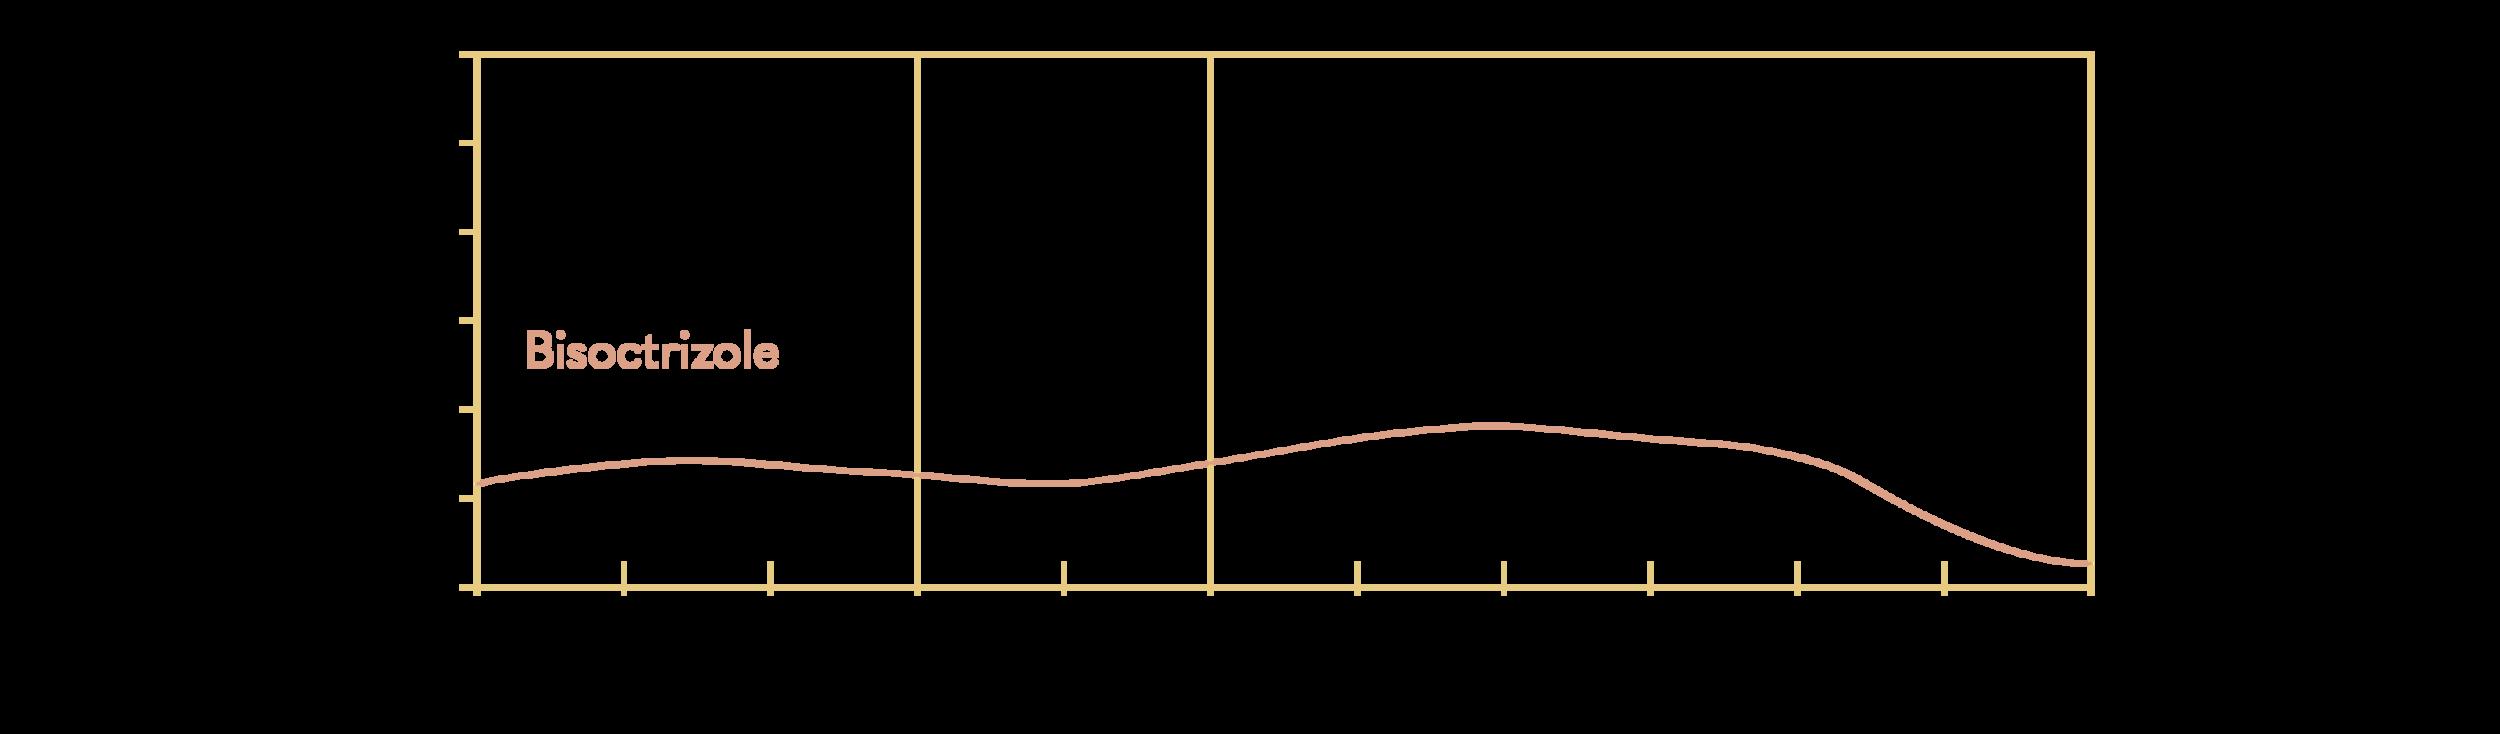 Bisoctrizole; Tinosorb M (BASF); Parsol Max (DSM); INCI: Methylene Bis-Benzotriazolyl Tetramethylbutylphenol